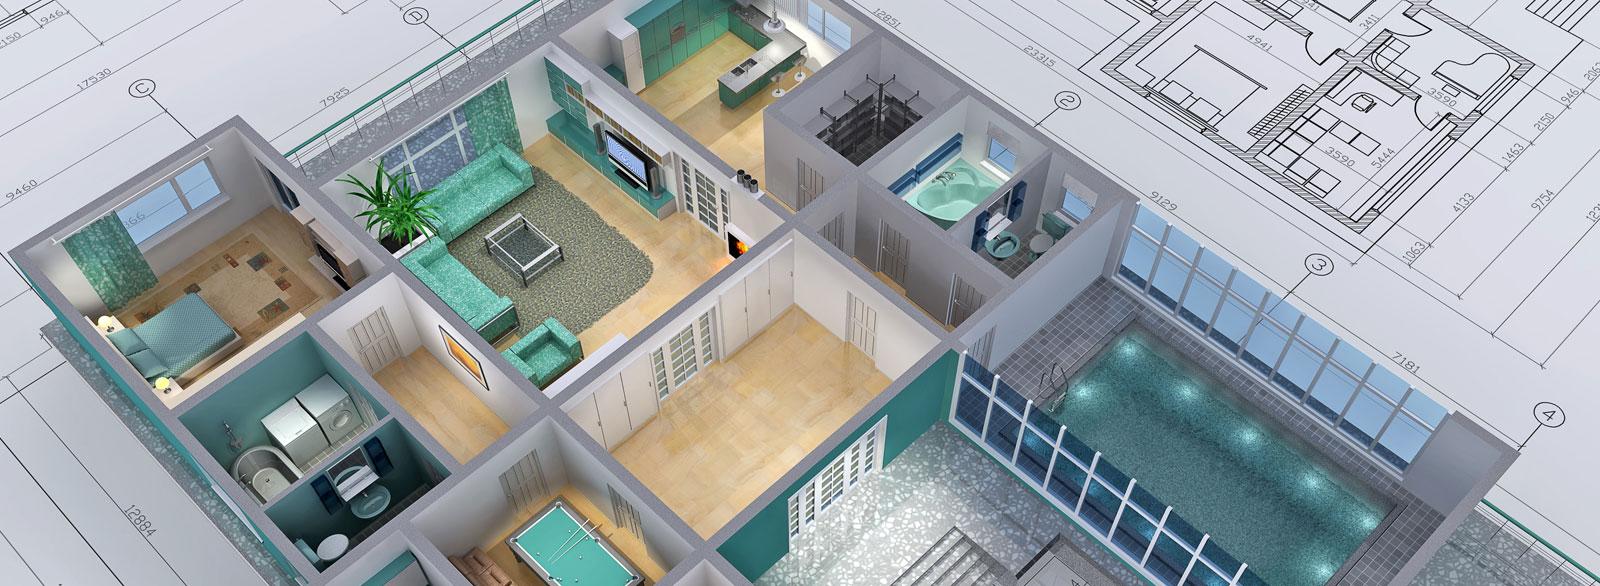 Gesti n de proyectos dise o de interiores dsigno - Proyecto de diseno de interiores ...